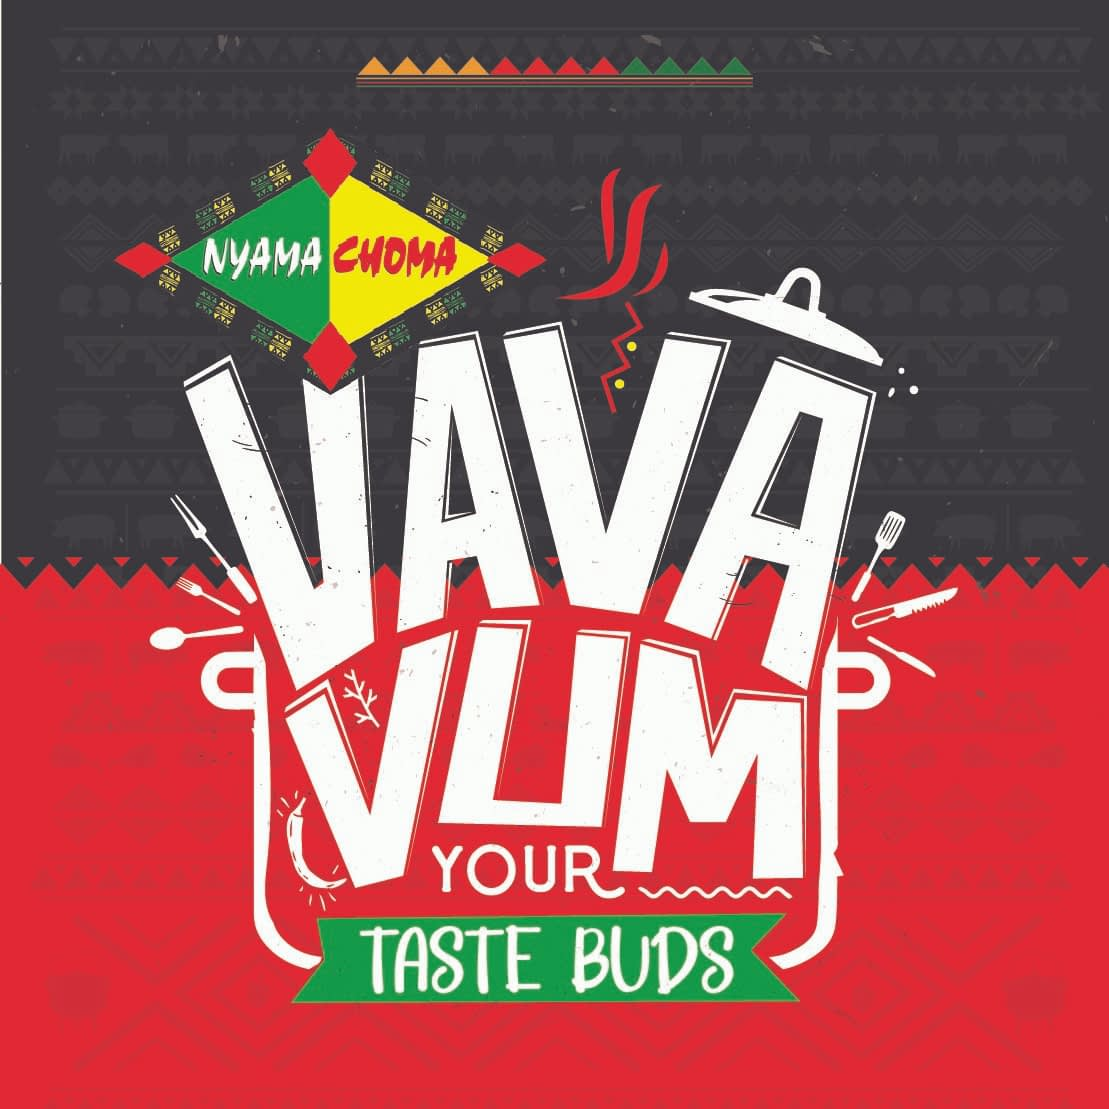 Nyama Choma Vava Vum Your tastebuds